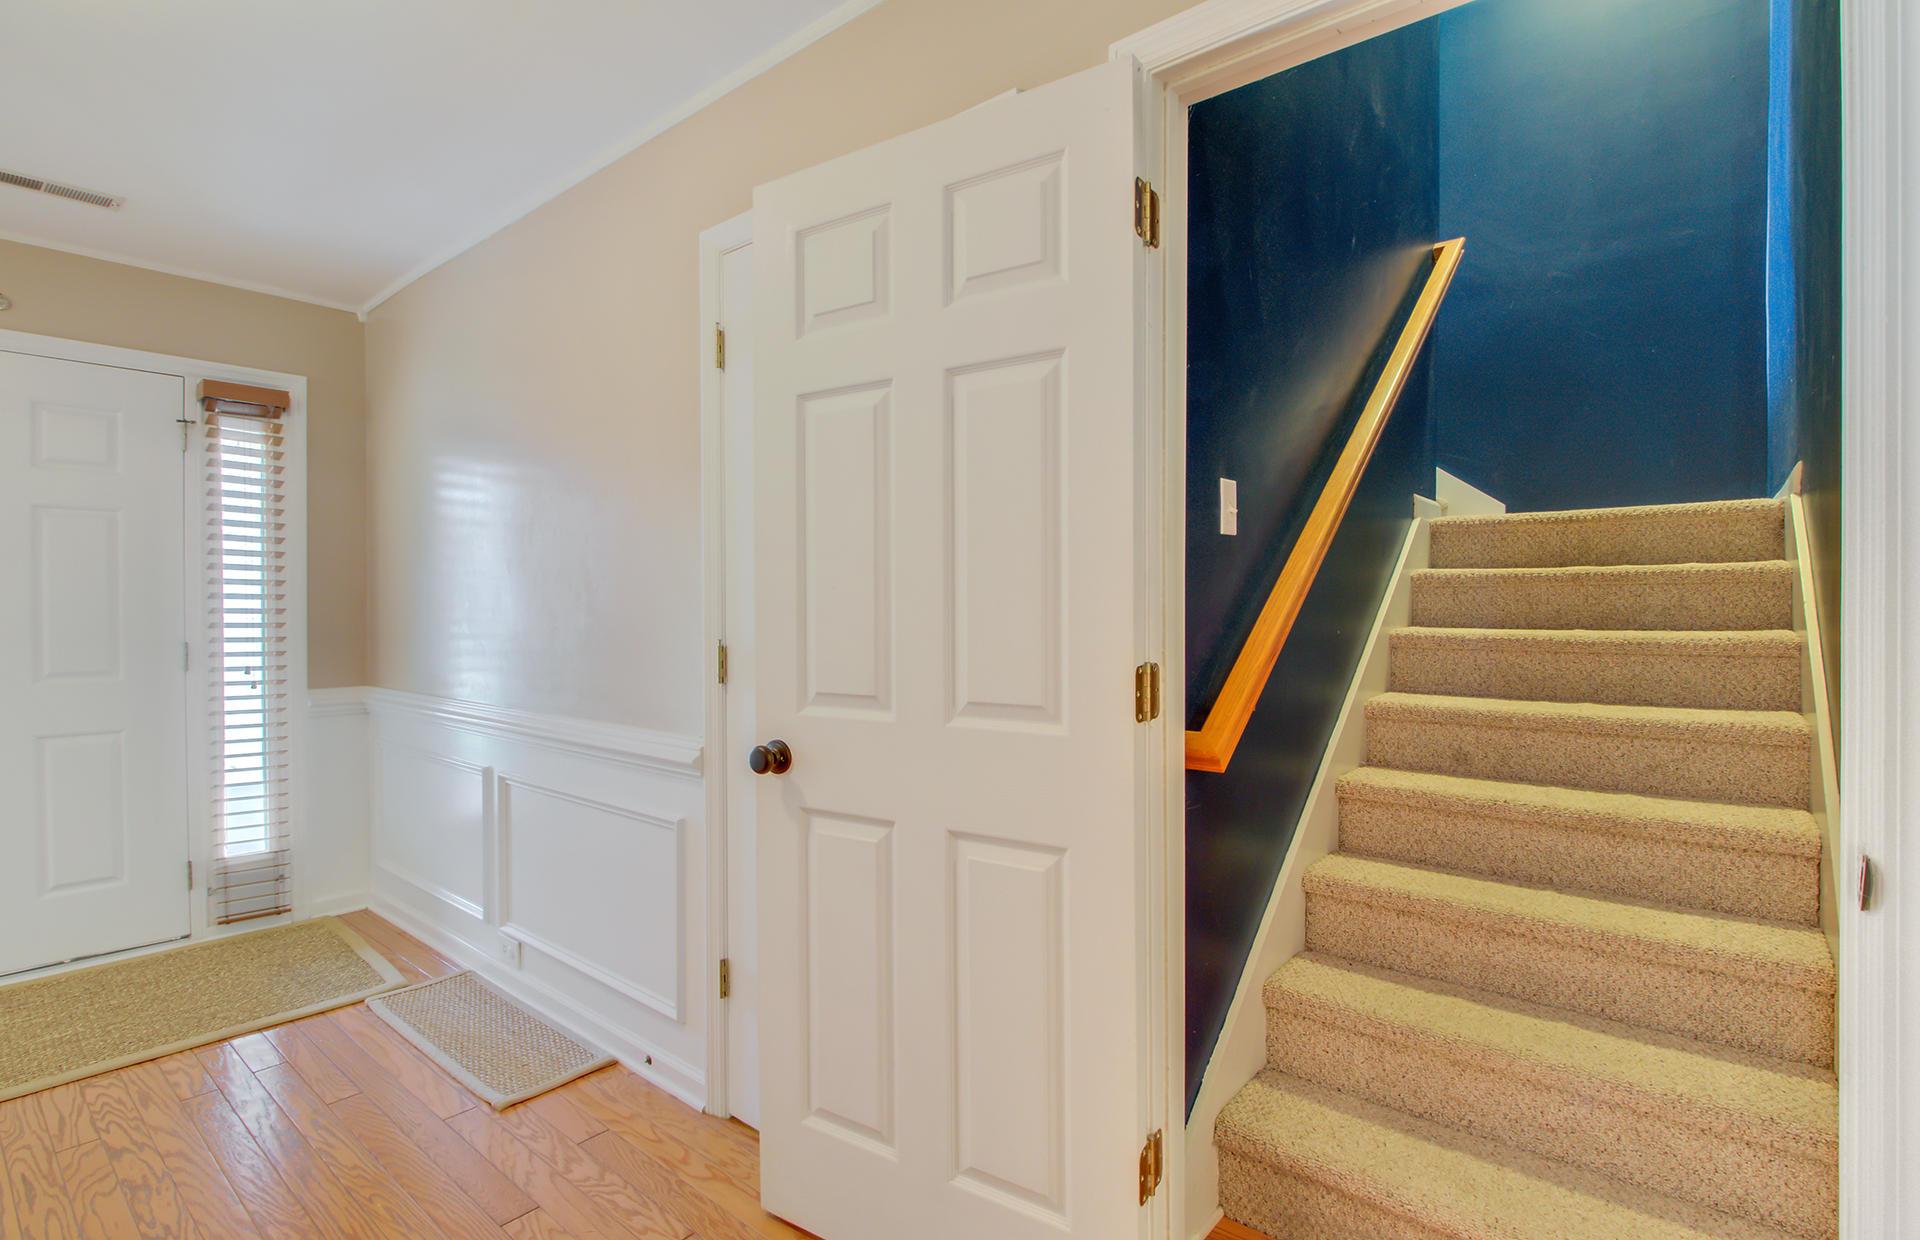 Park West Homes For Sale - 1500 Wellesley, Mount Pleasant, SC - 0